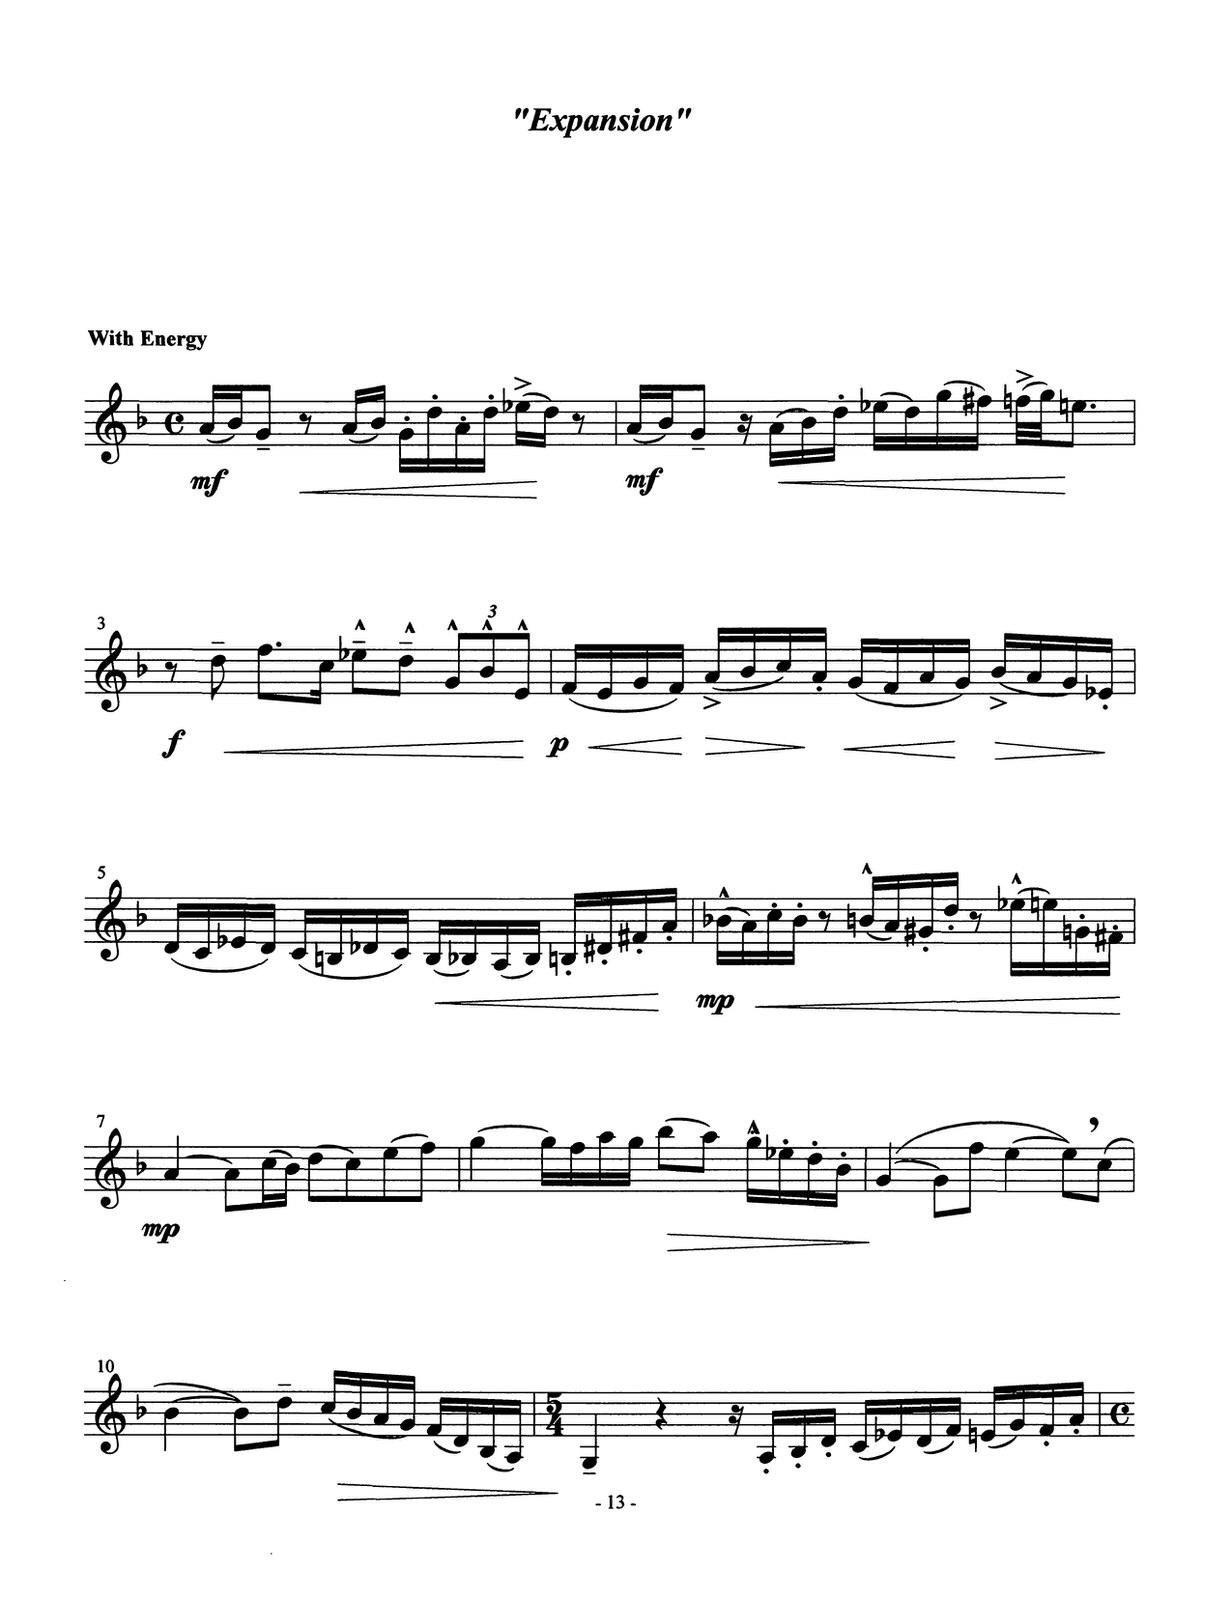 Ponzo, Ten Realizations for Solo Trumpet_000015